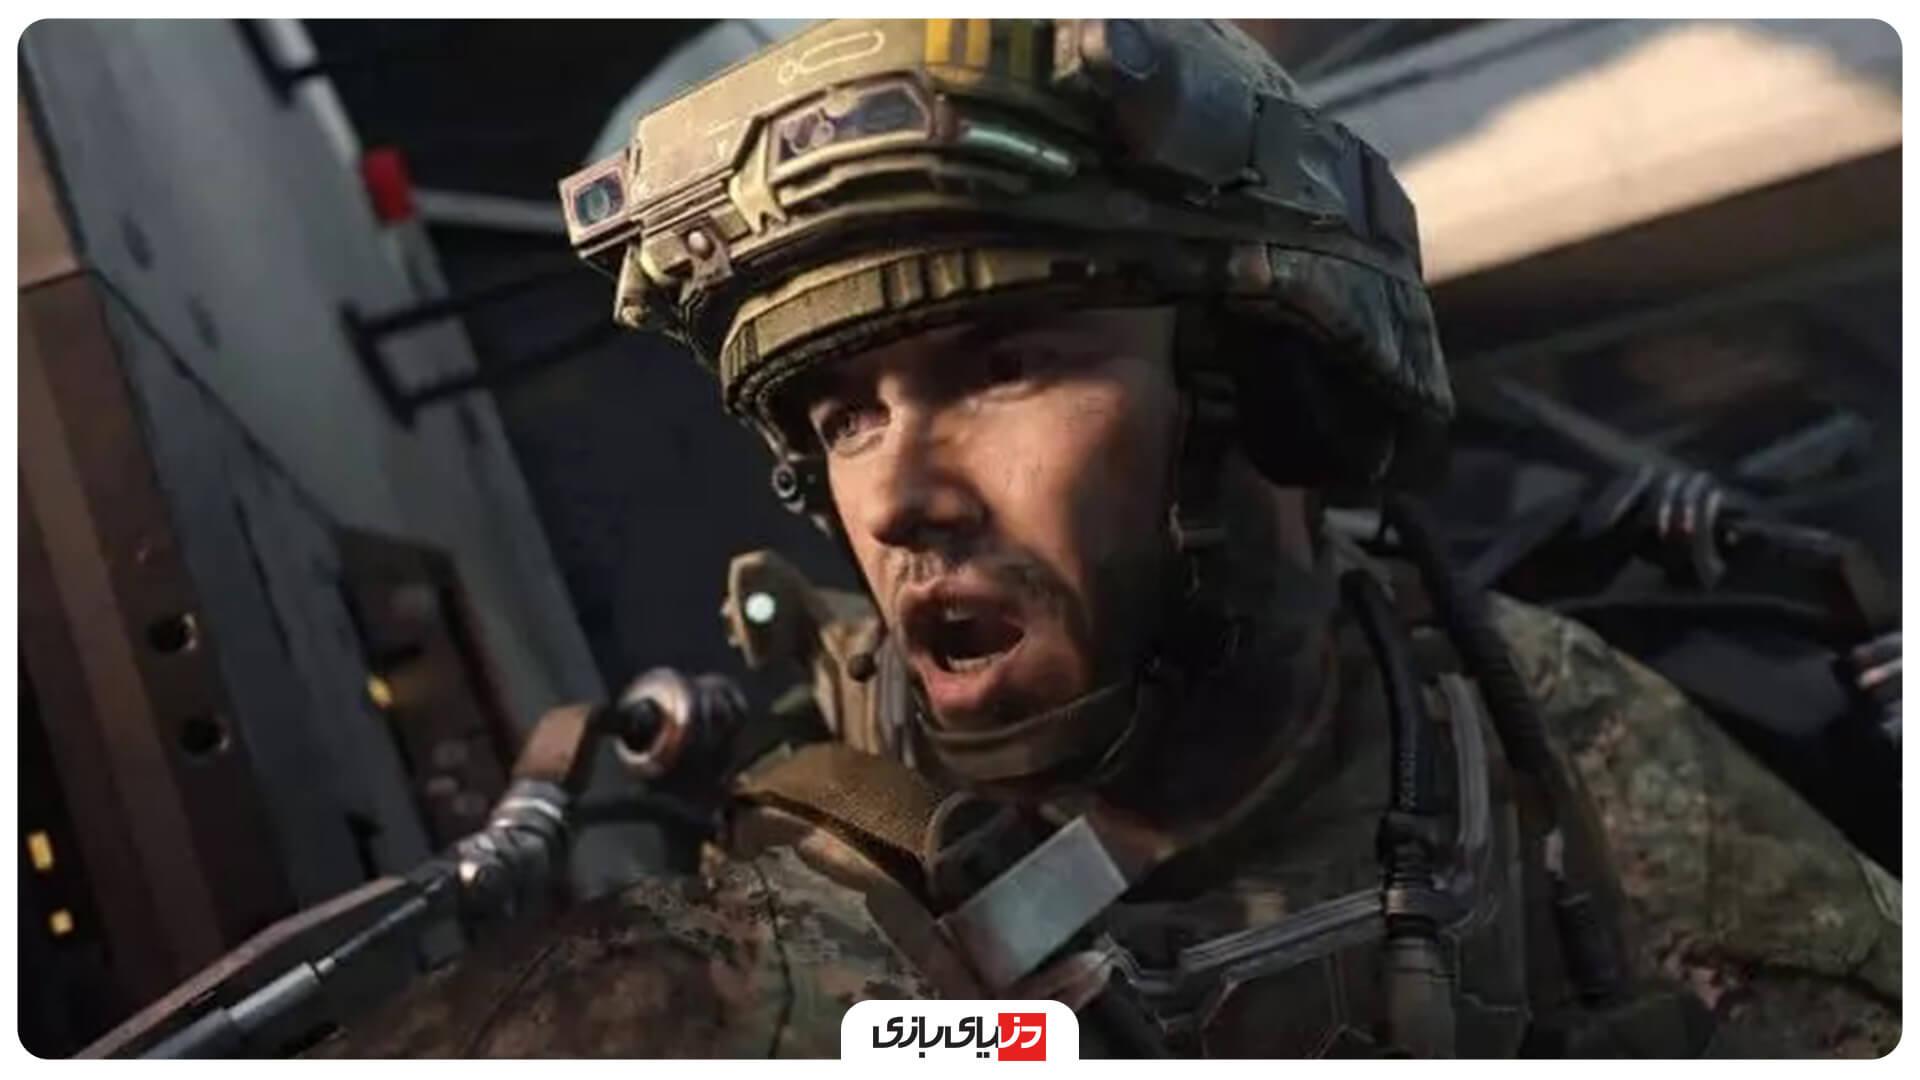 بازی جنگی Call Of Duty: Advanced Warfare